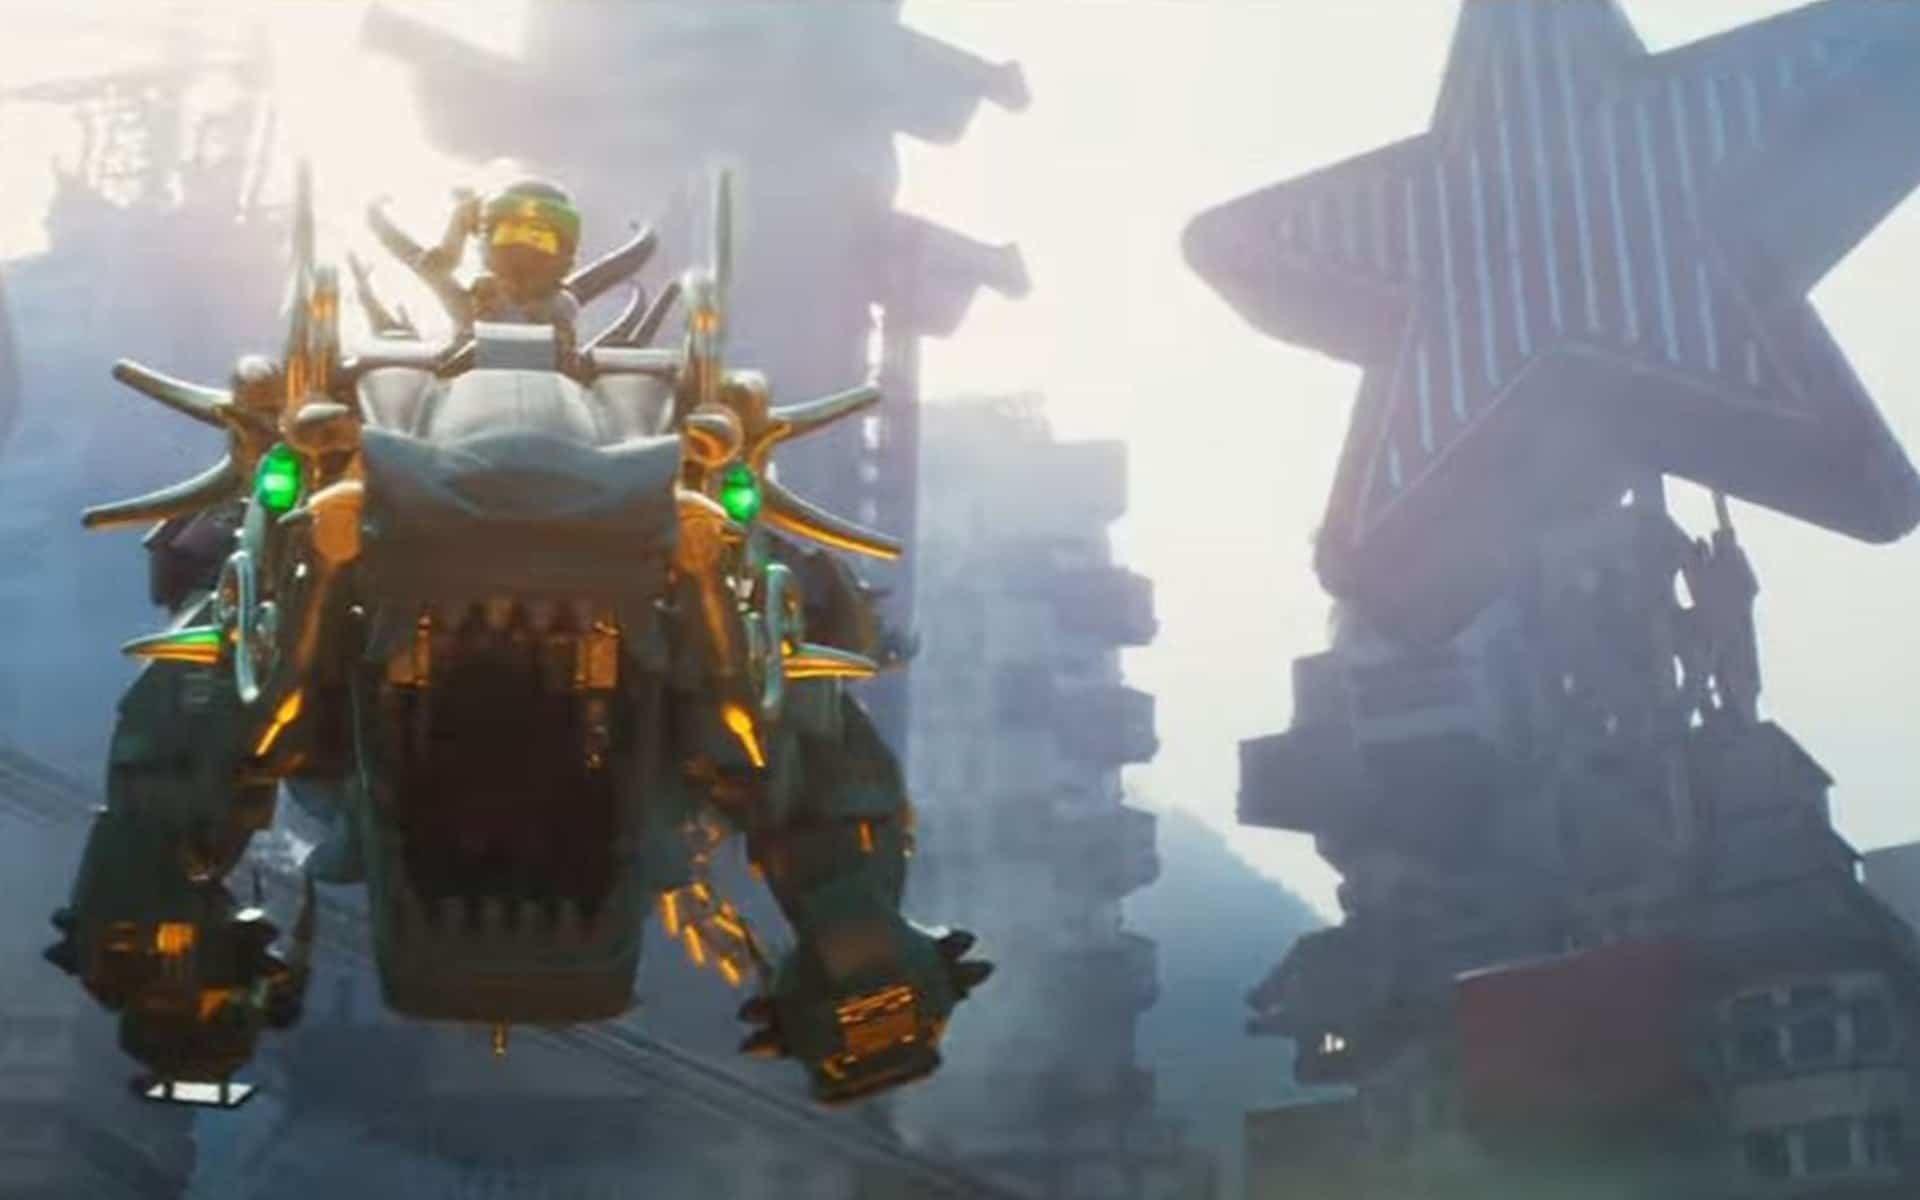 3D Cmputer-Animated Film The LEGO Ninjago Movie Wallpapers